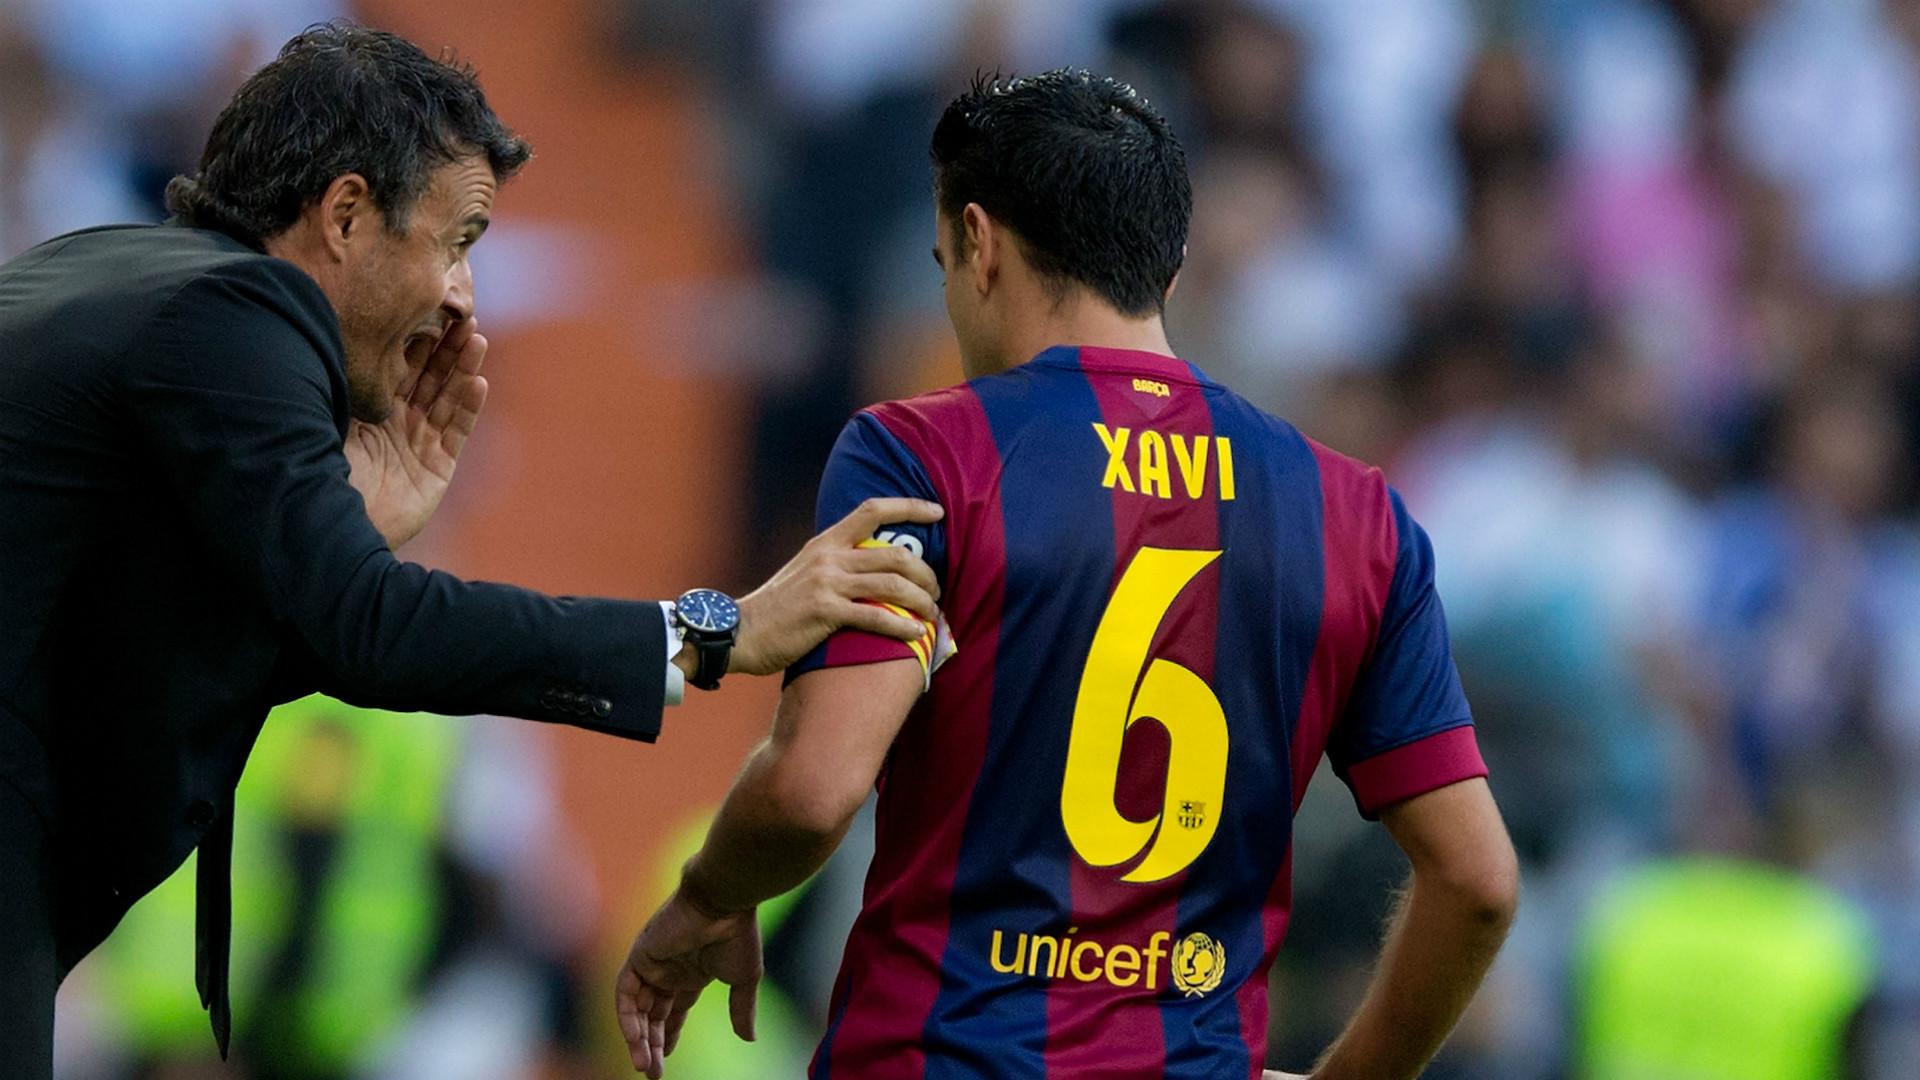 Luis Enrique Xavi Real Madrid CF v FC Barcelona - La Liga 10252014